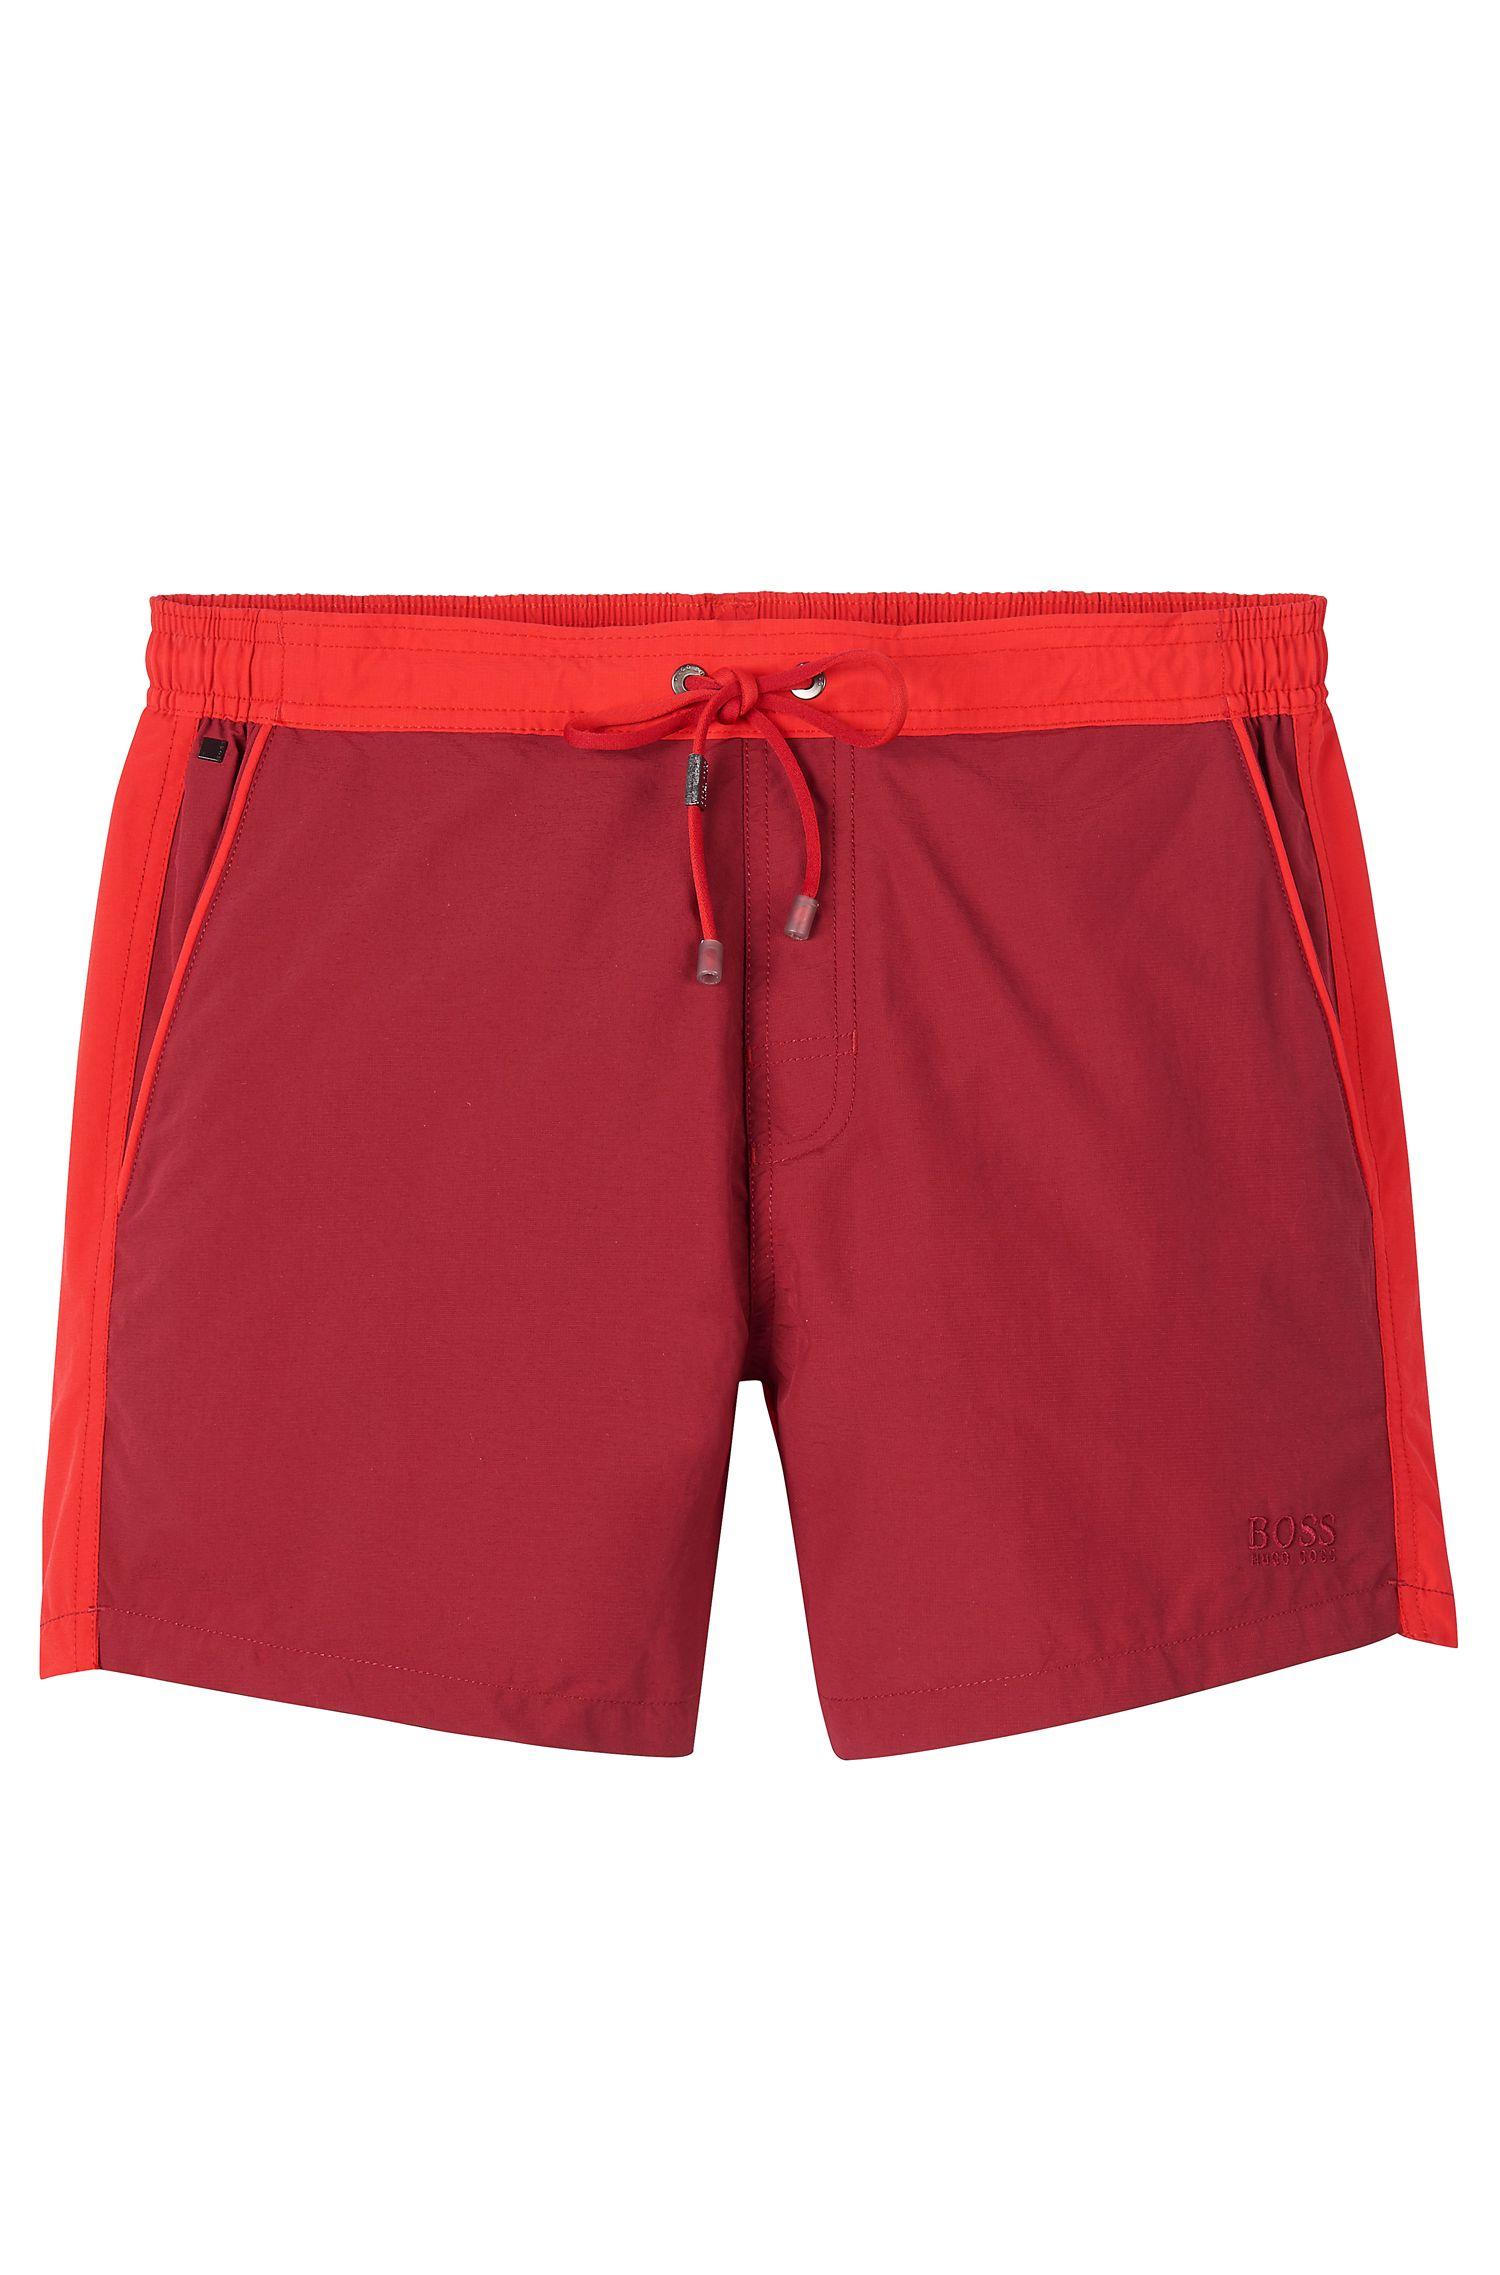 'Snapper'   Quick Dry Swim Trunks